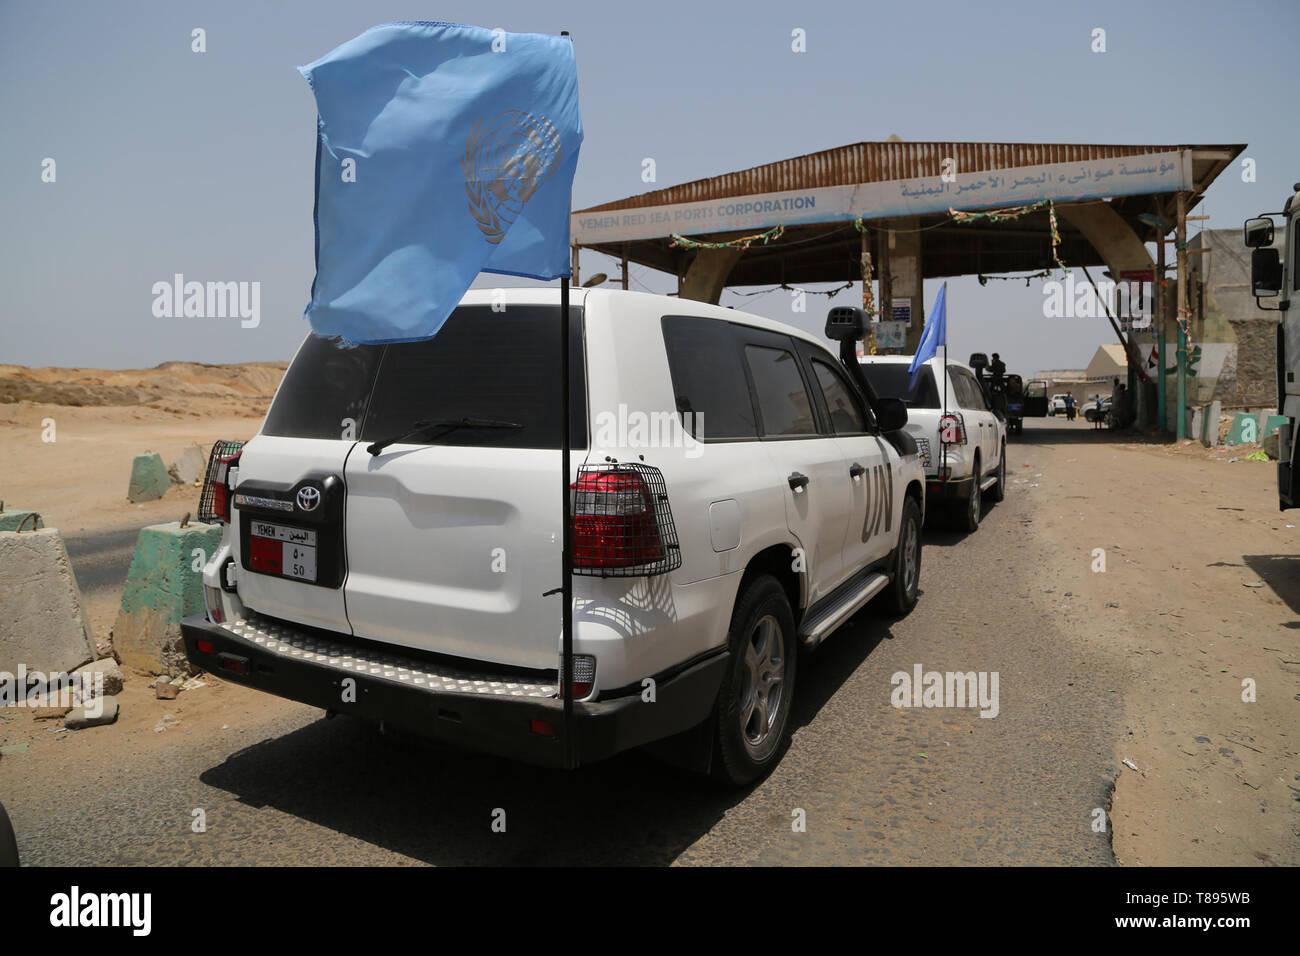 (190511) -- HODEIDAH (YEMEN), May 11, 2019 (Xinhua) -- UN vehicles arrive at the entrance of Salif port in Hodeidah, Yemen, on May 11, 2019. Yemen's Houthi rebels began on Saturday withdrawal from two ports of Hodeidah Province, eyewitnesses said. (Xinhua) Stock Photo